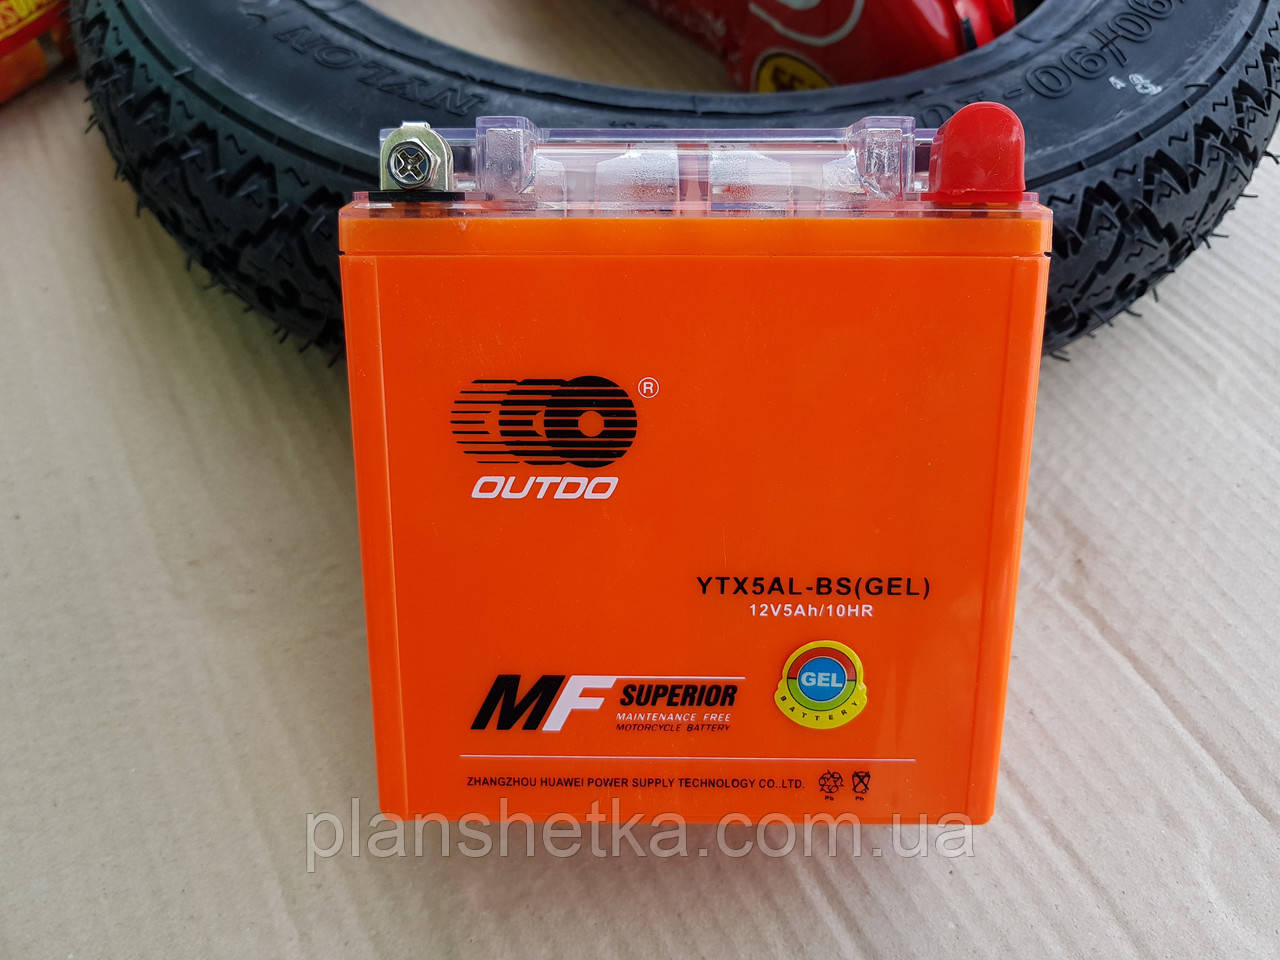 Акумулятор гелевий 12В 5А Active високий помаранчевий